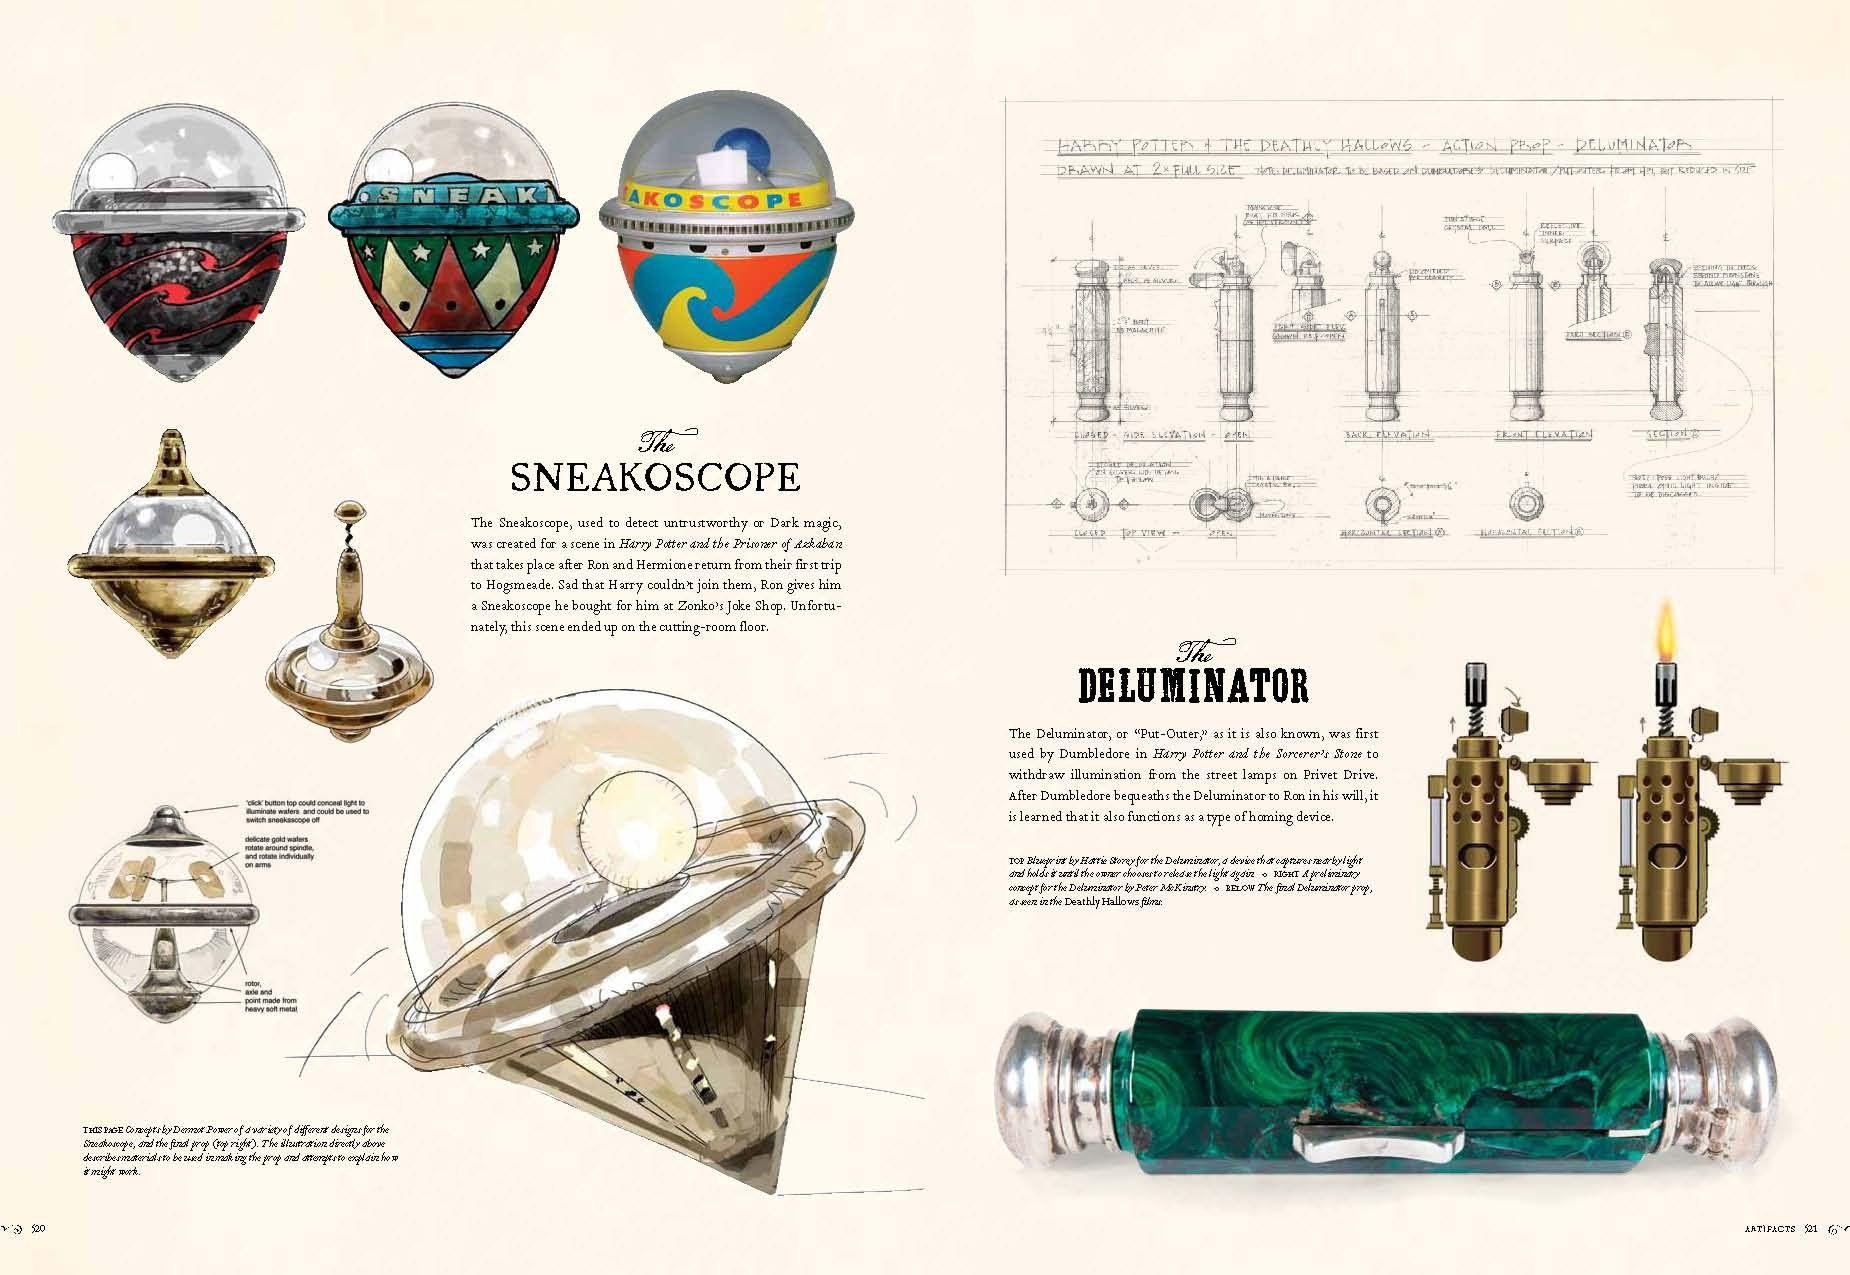 Sneakoscope & Deluminator concept art | Mr Harry J. Potter, Number 4 ...